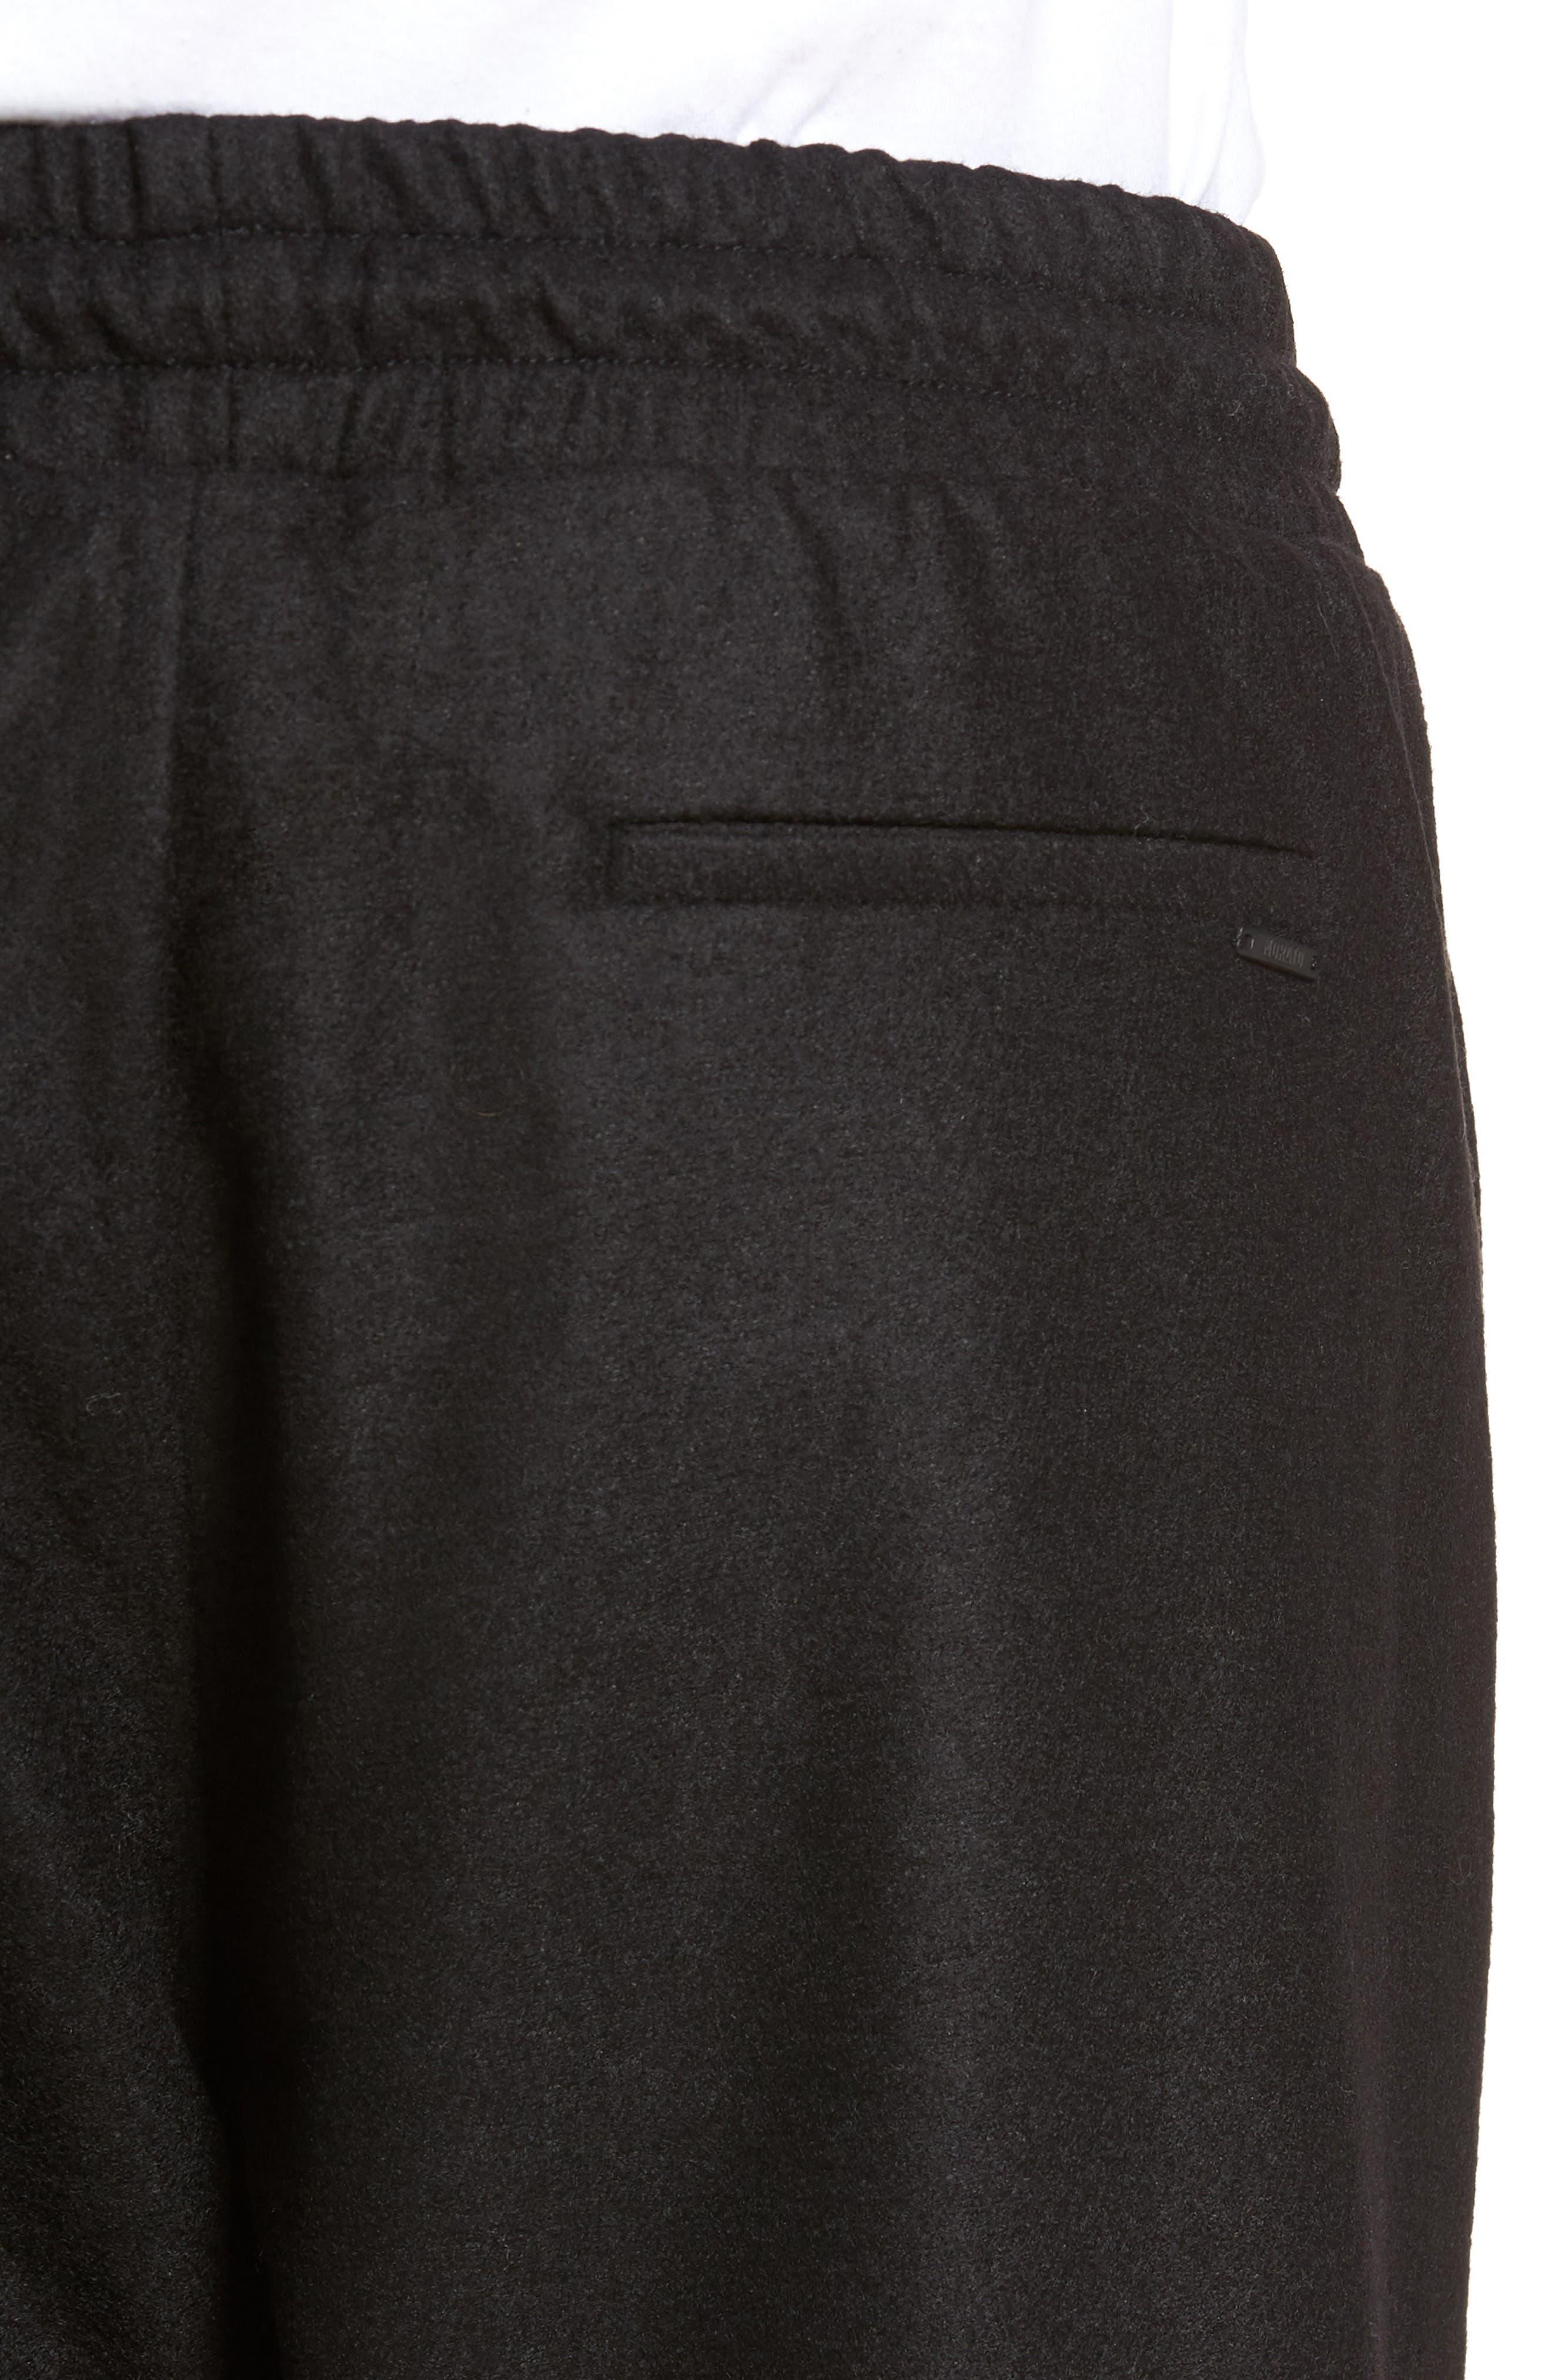 Drawstring Waist Pants,                             Alternate thumbnail 4, color,                             Black